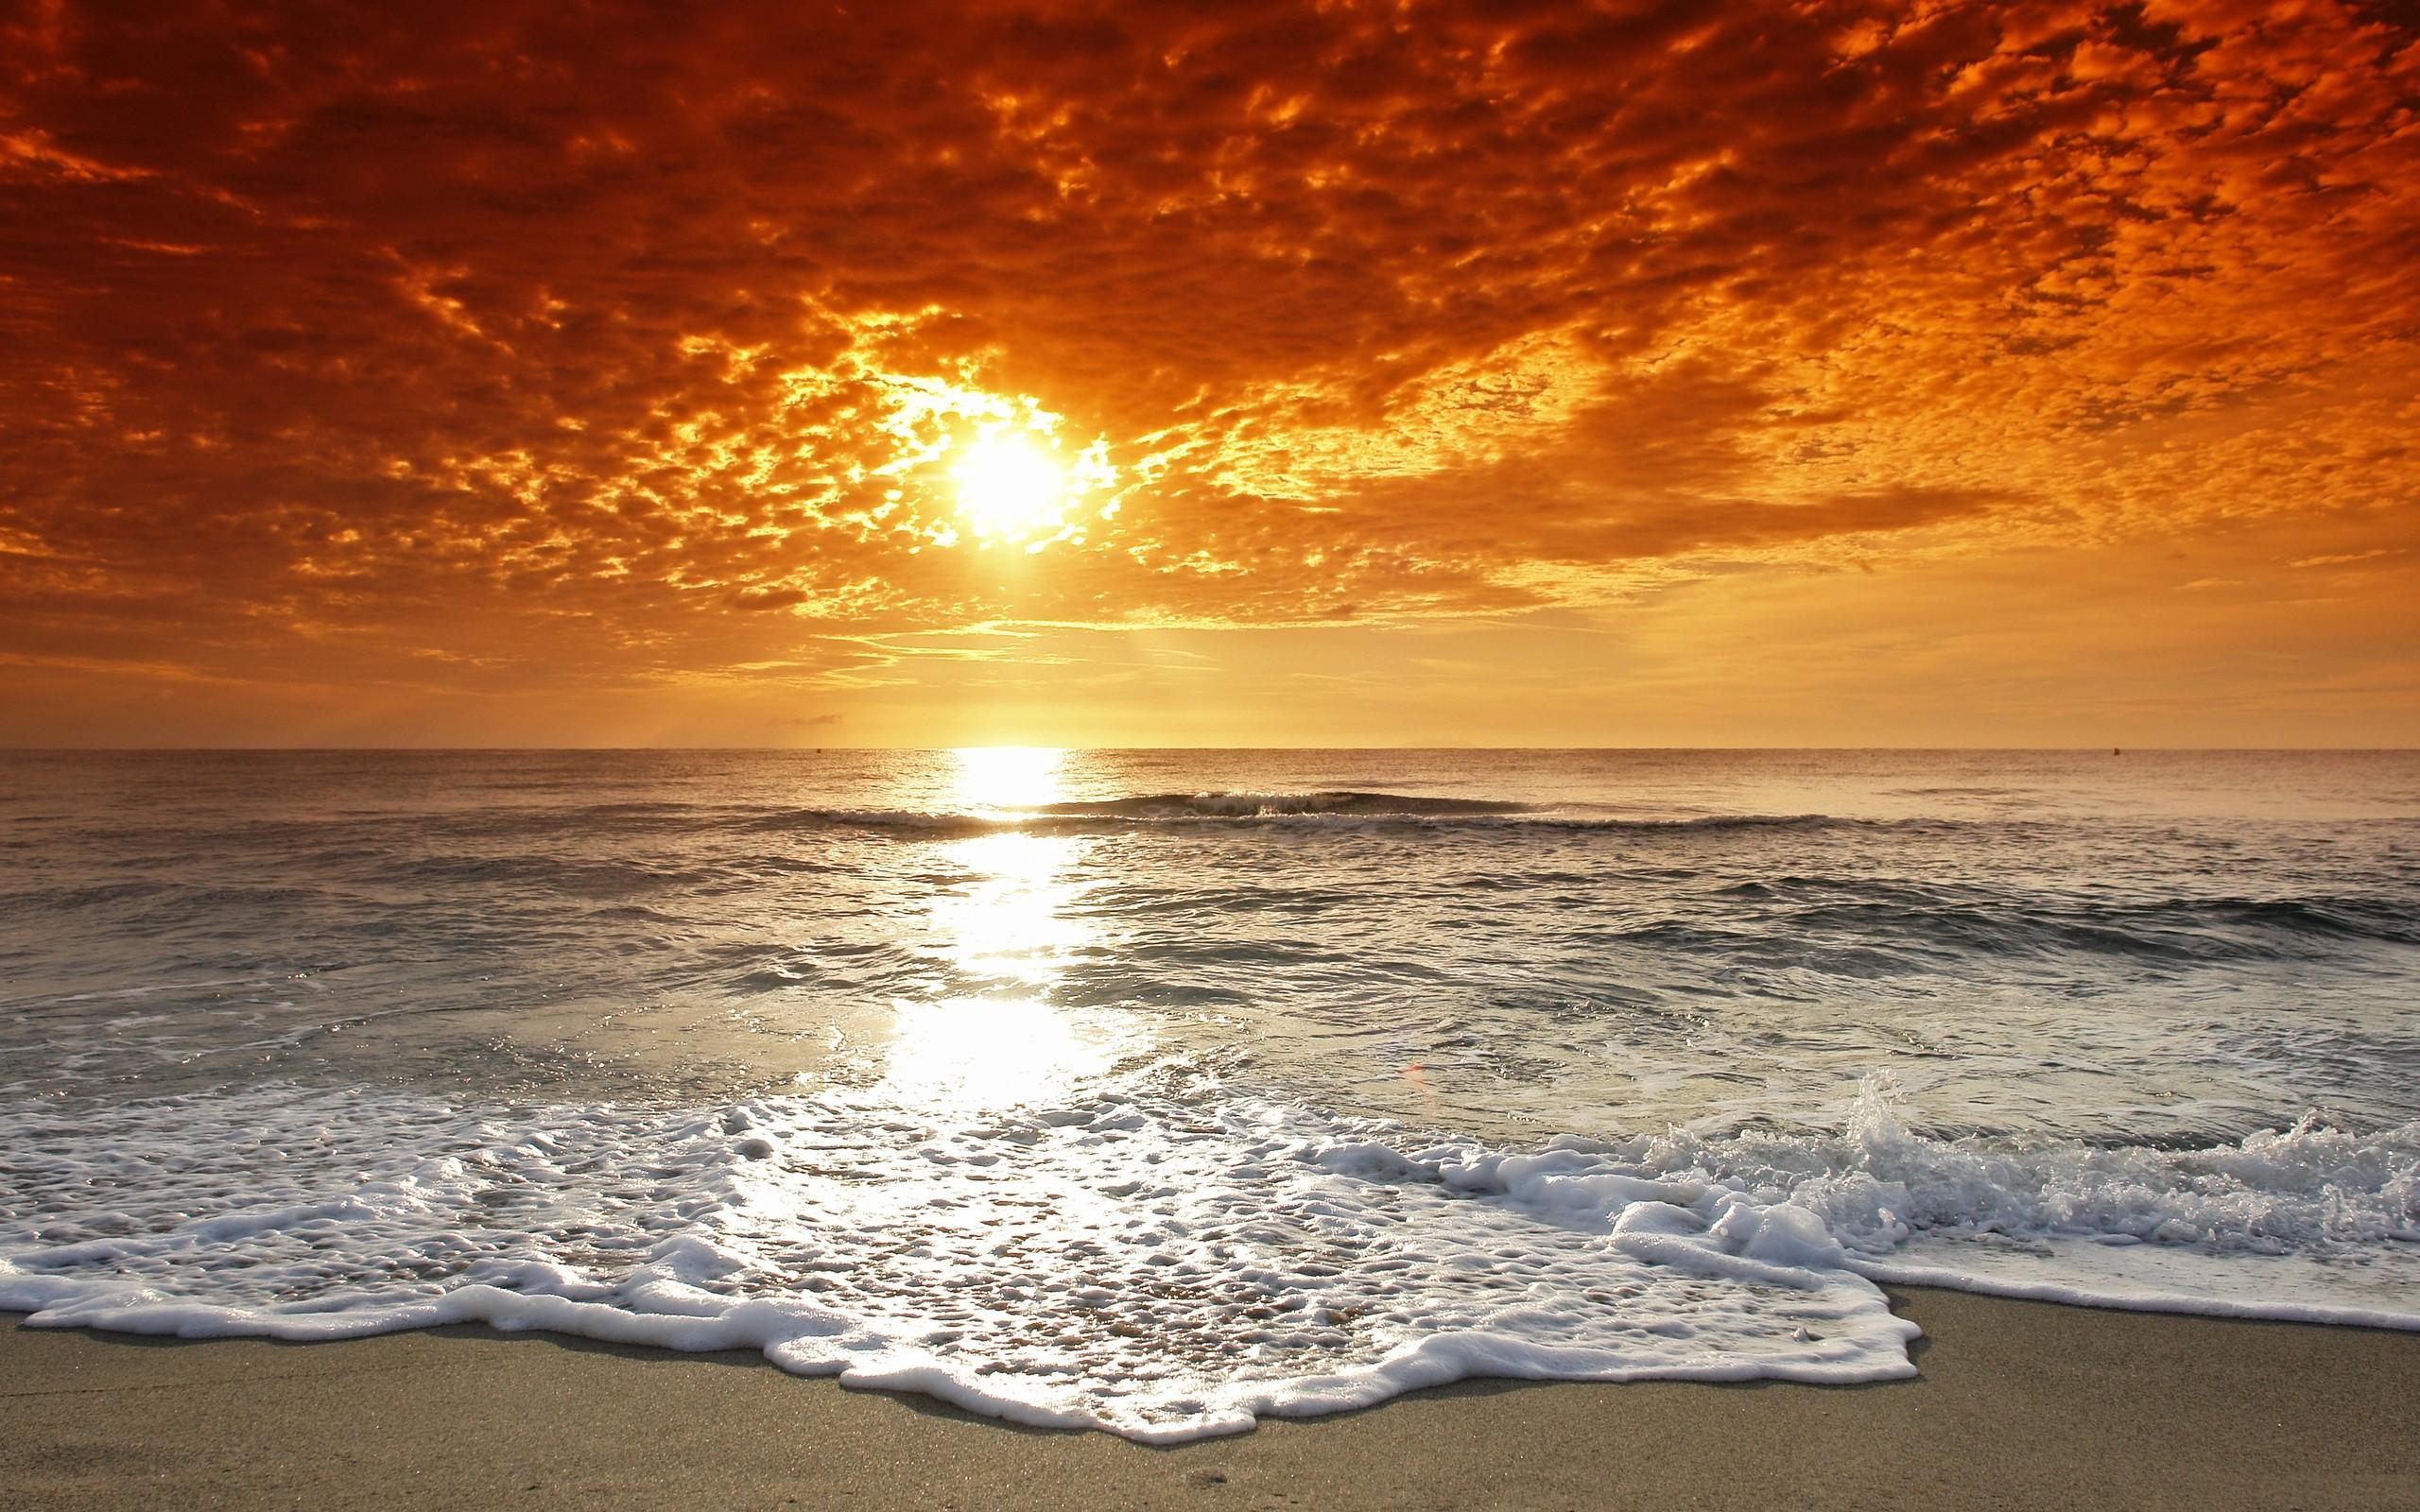 Playa al atardecer - 2560x1600